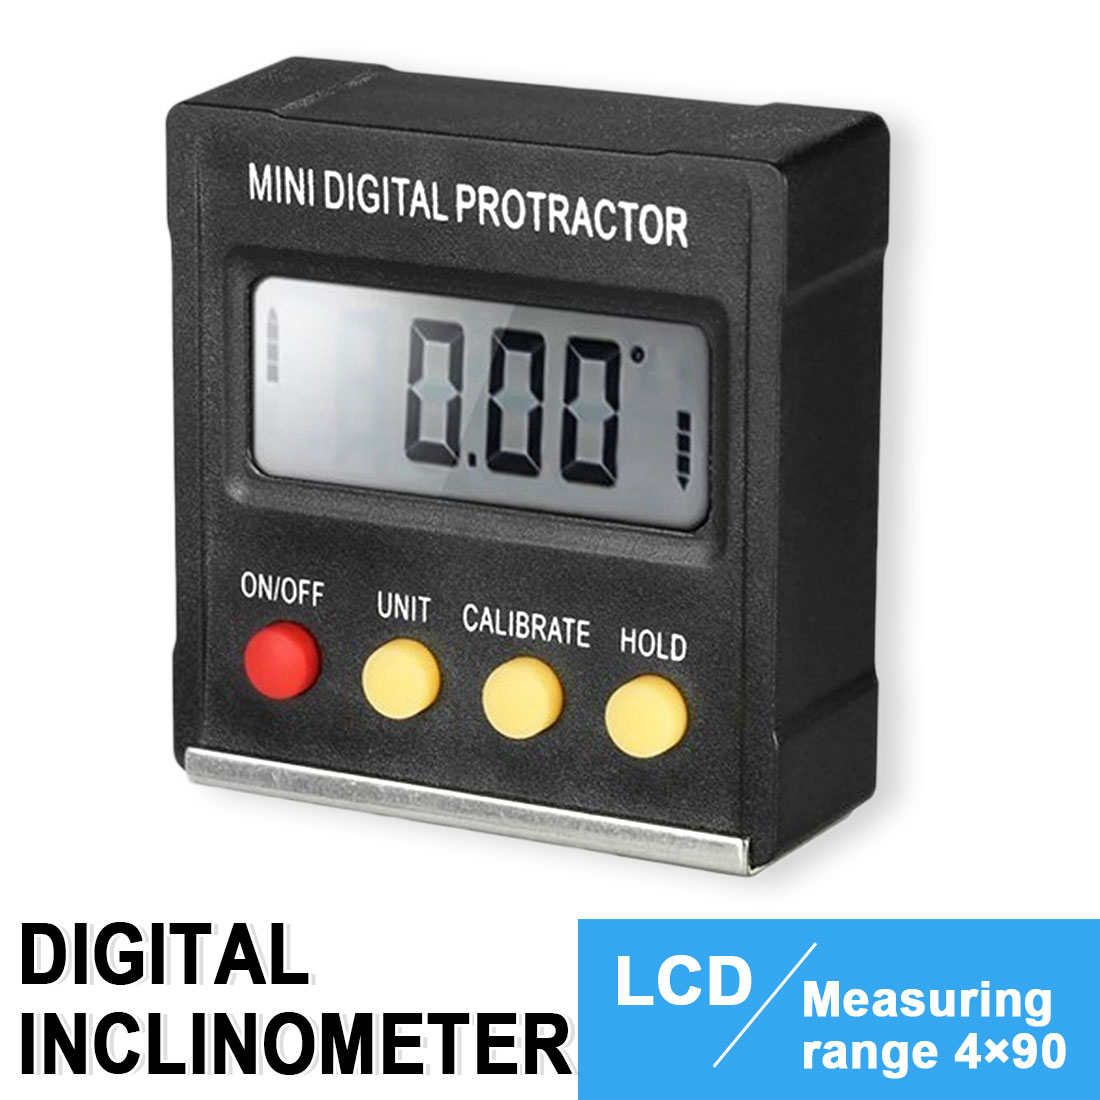 Portable Gauge Mini Digital Protractor Inclinometer Angle Finder 360 Degree